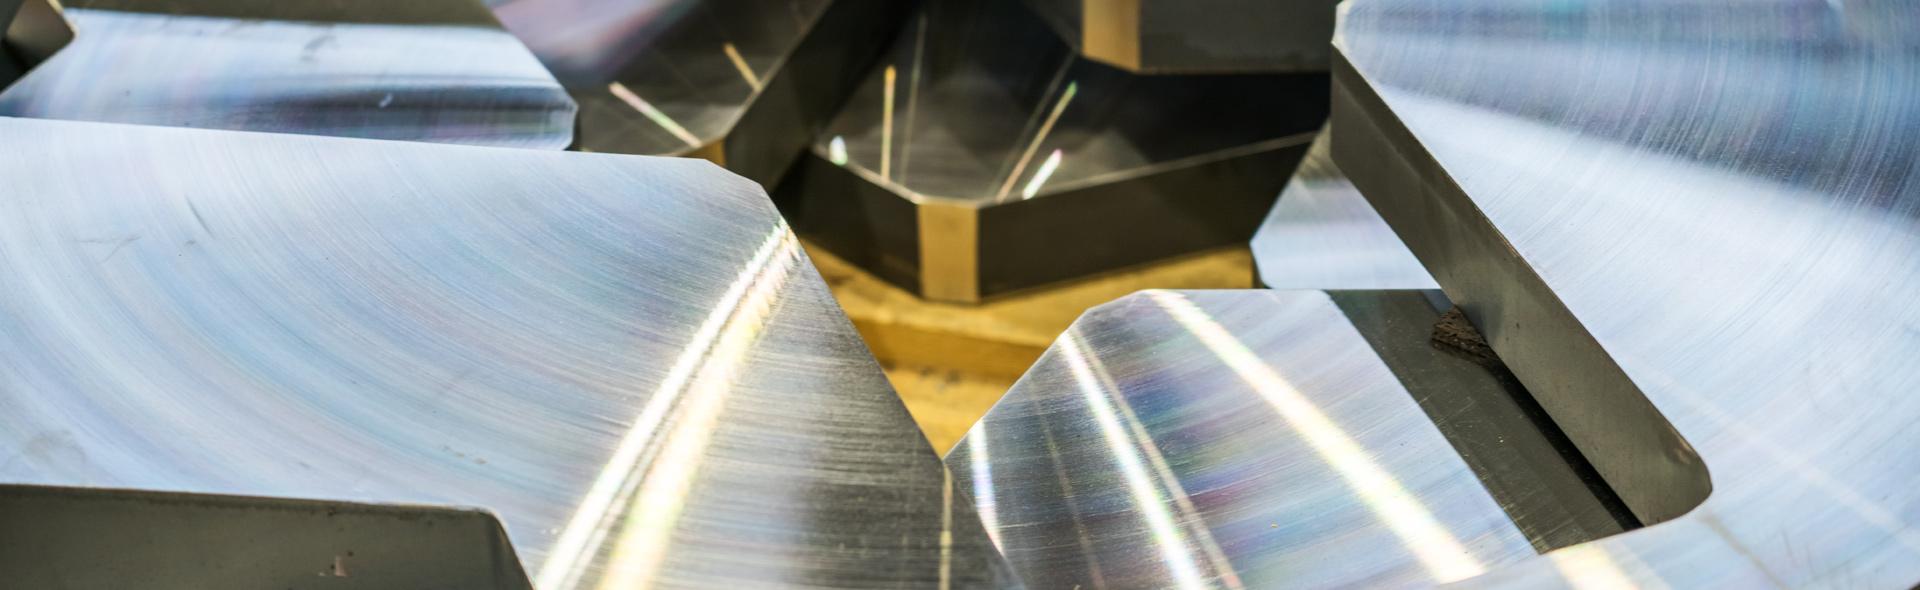 Produkte | Maschinenbau Mundil GmbH & Co. KG